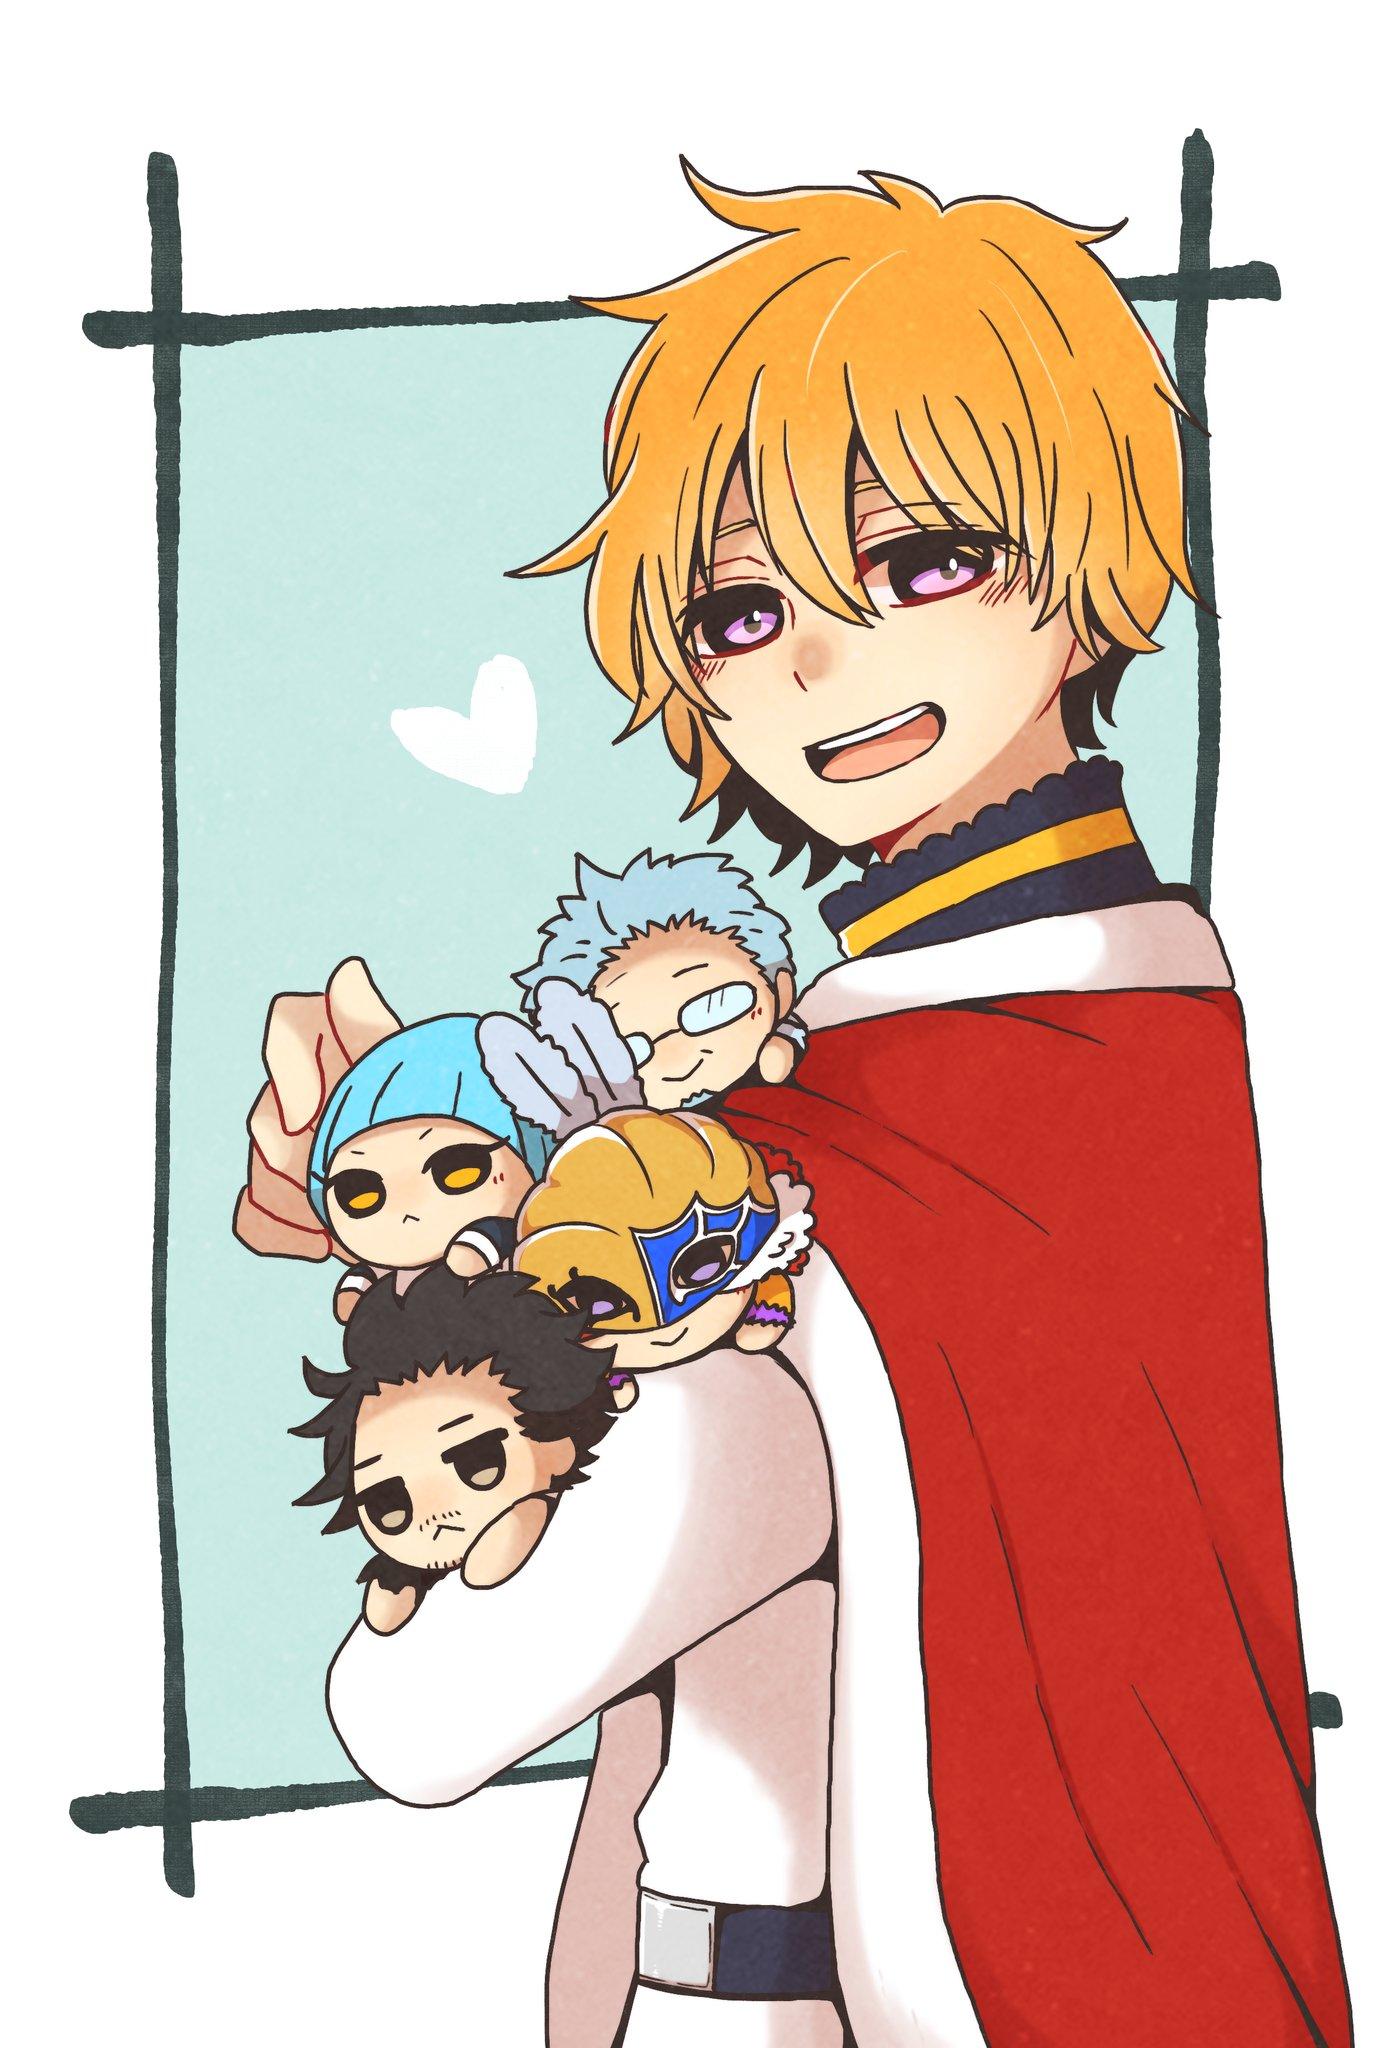 Black Clover Image #2978510 - Zerochan Anime Image Board